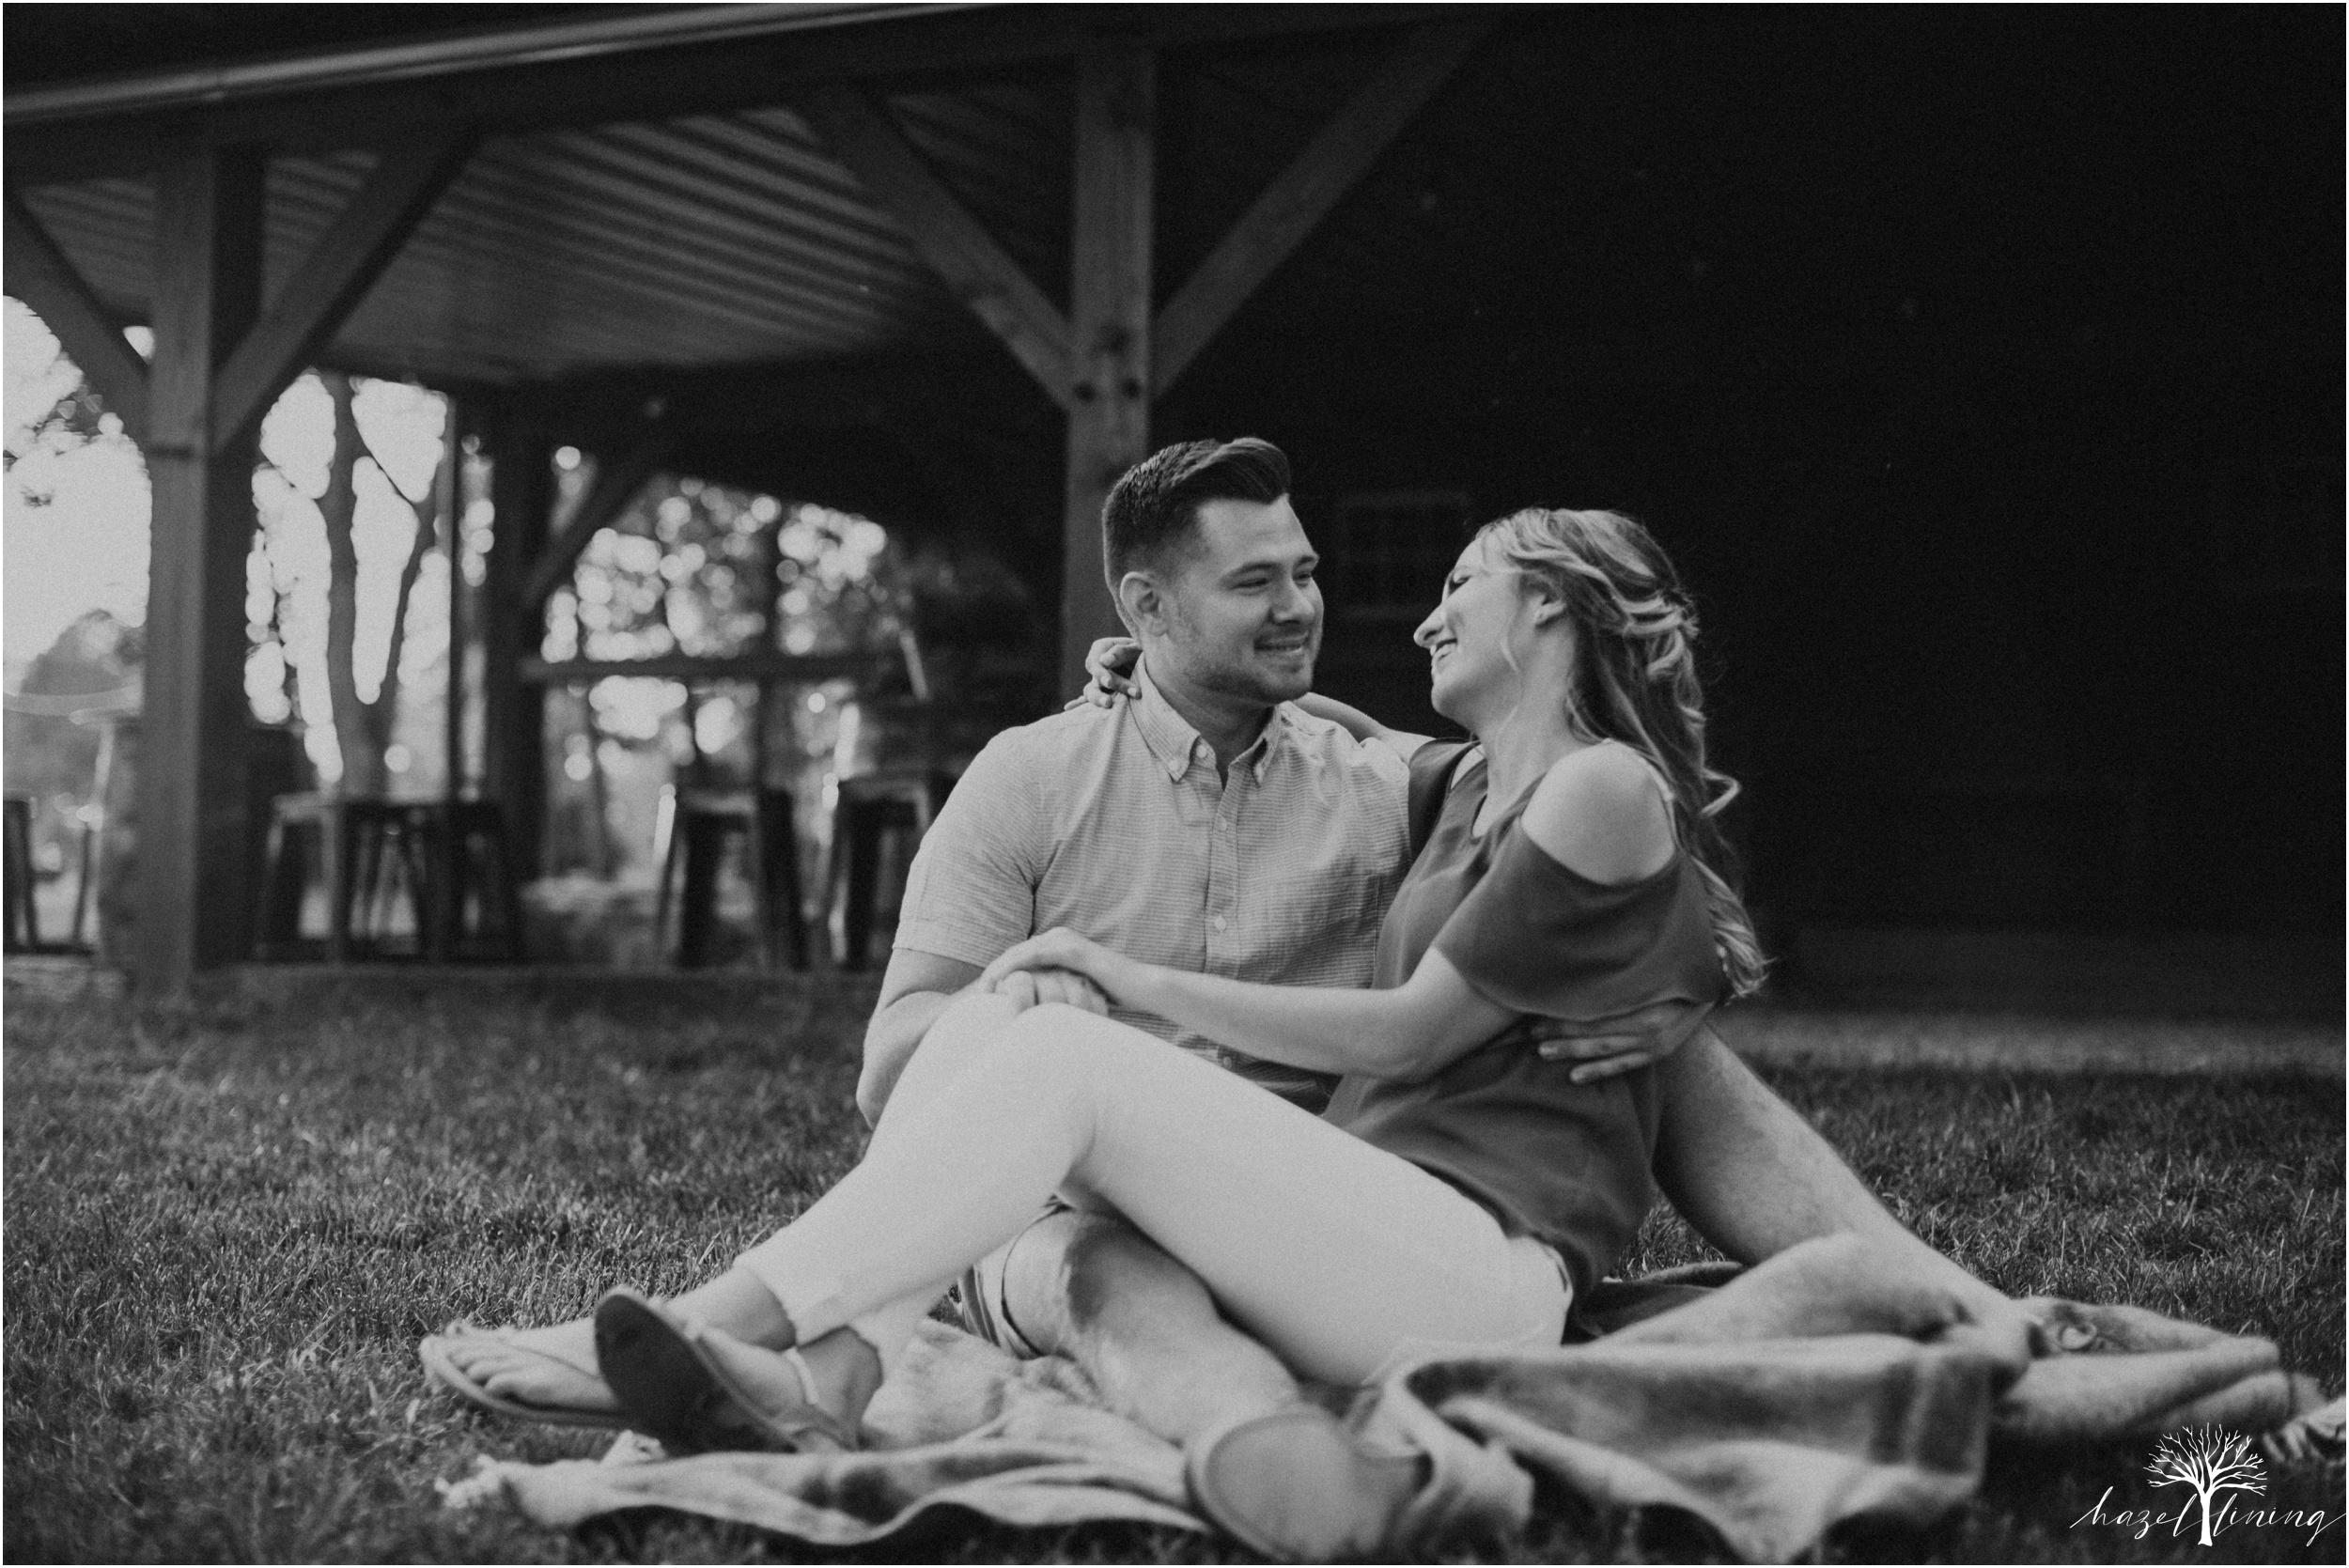 rachel-warner-chris-niedrist-the-farm-bakery-and-events-quakertown-pa-summer-engagement-hazel-lining-photography-destination-elopement-wedding-engagement-photography_0068.jpg